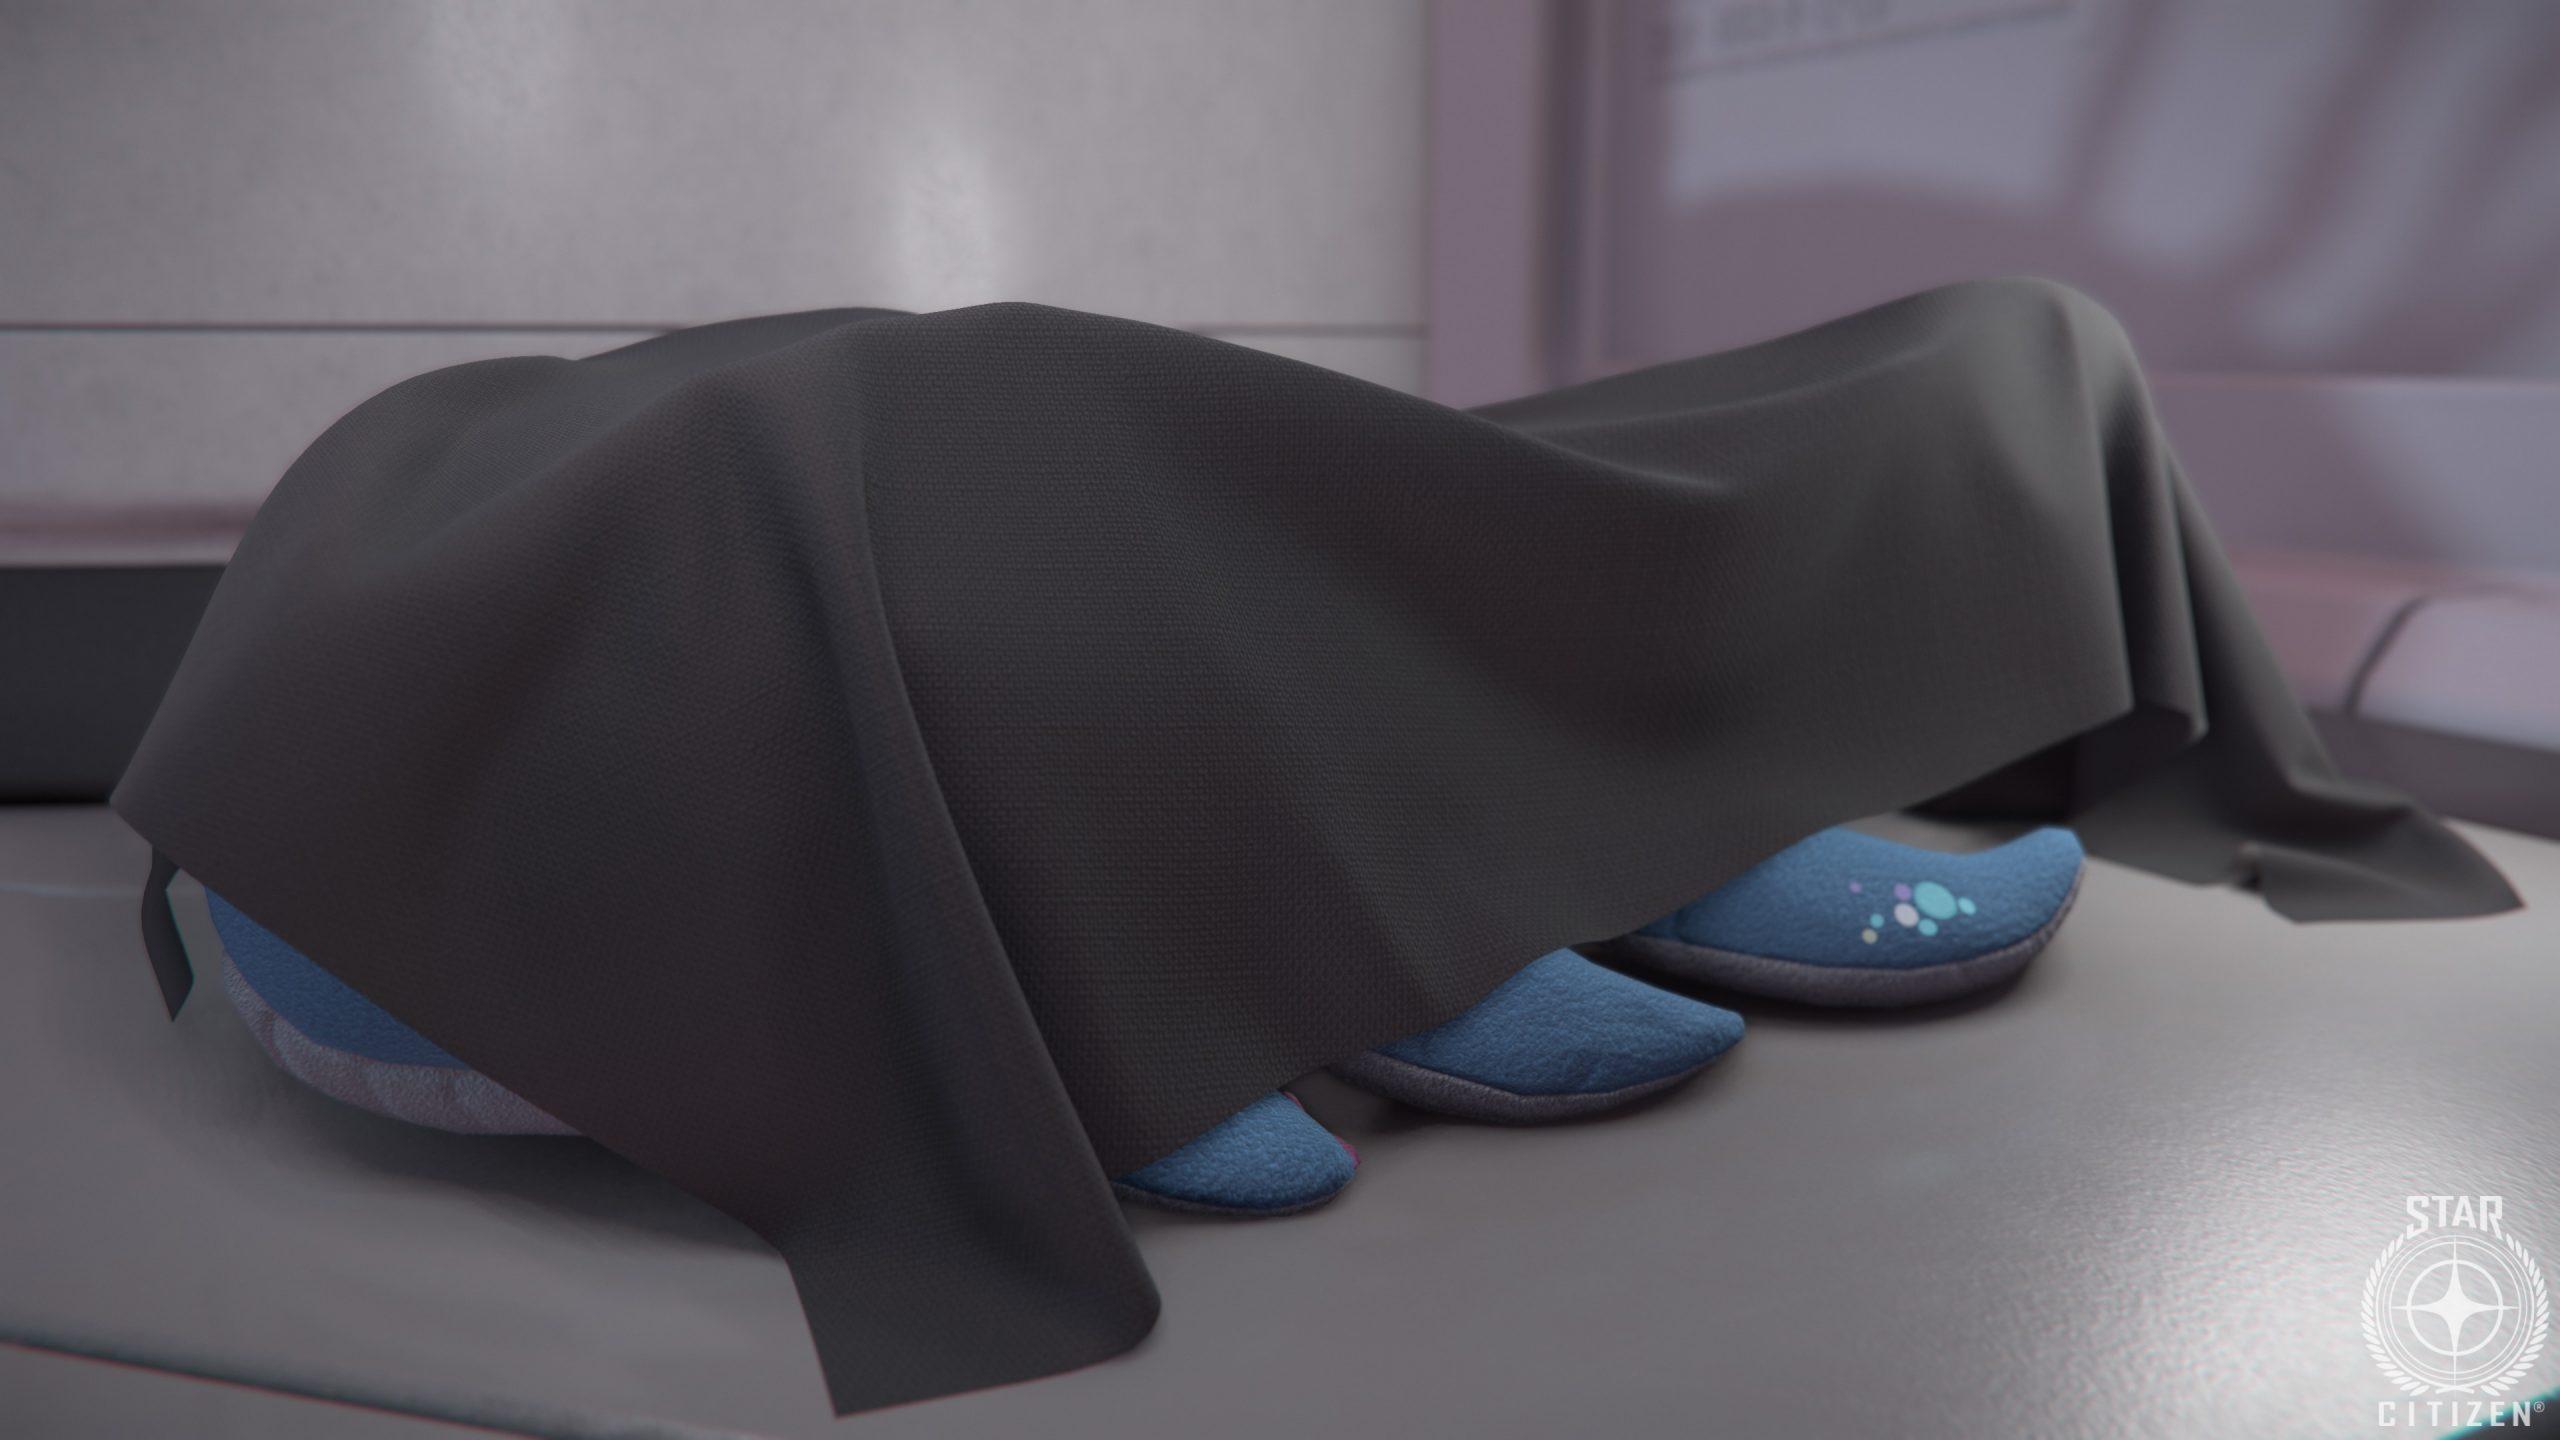 CloudImperiumGames StarCitizen Whale Plushy Sneak Peek 8348